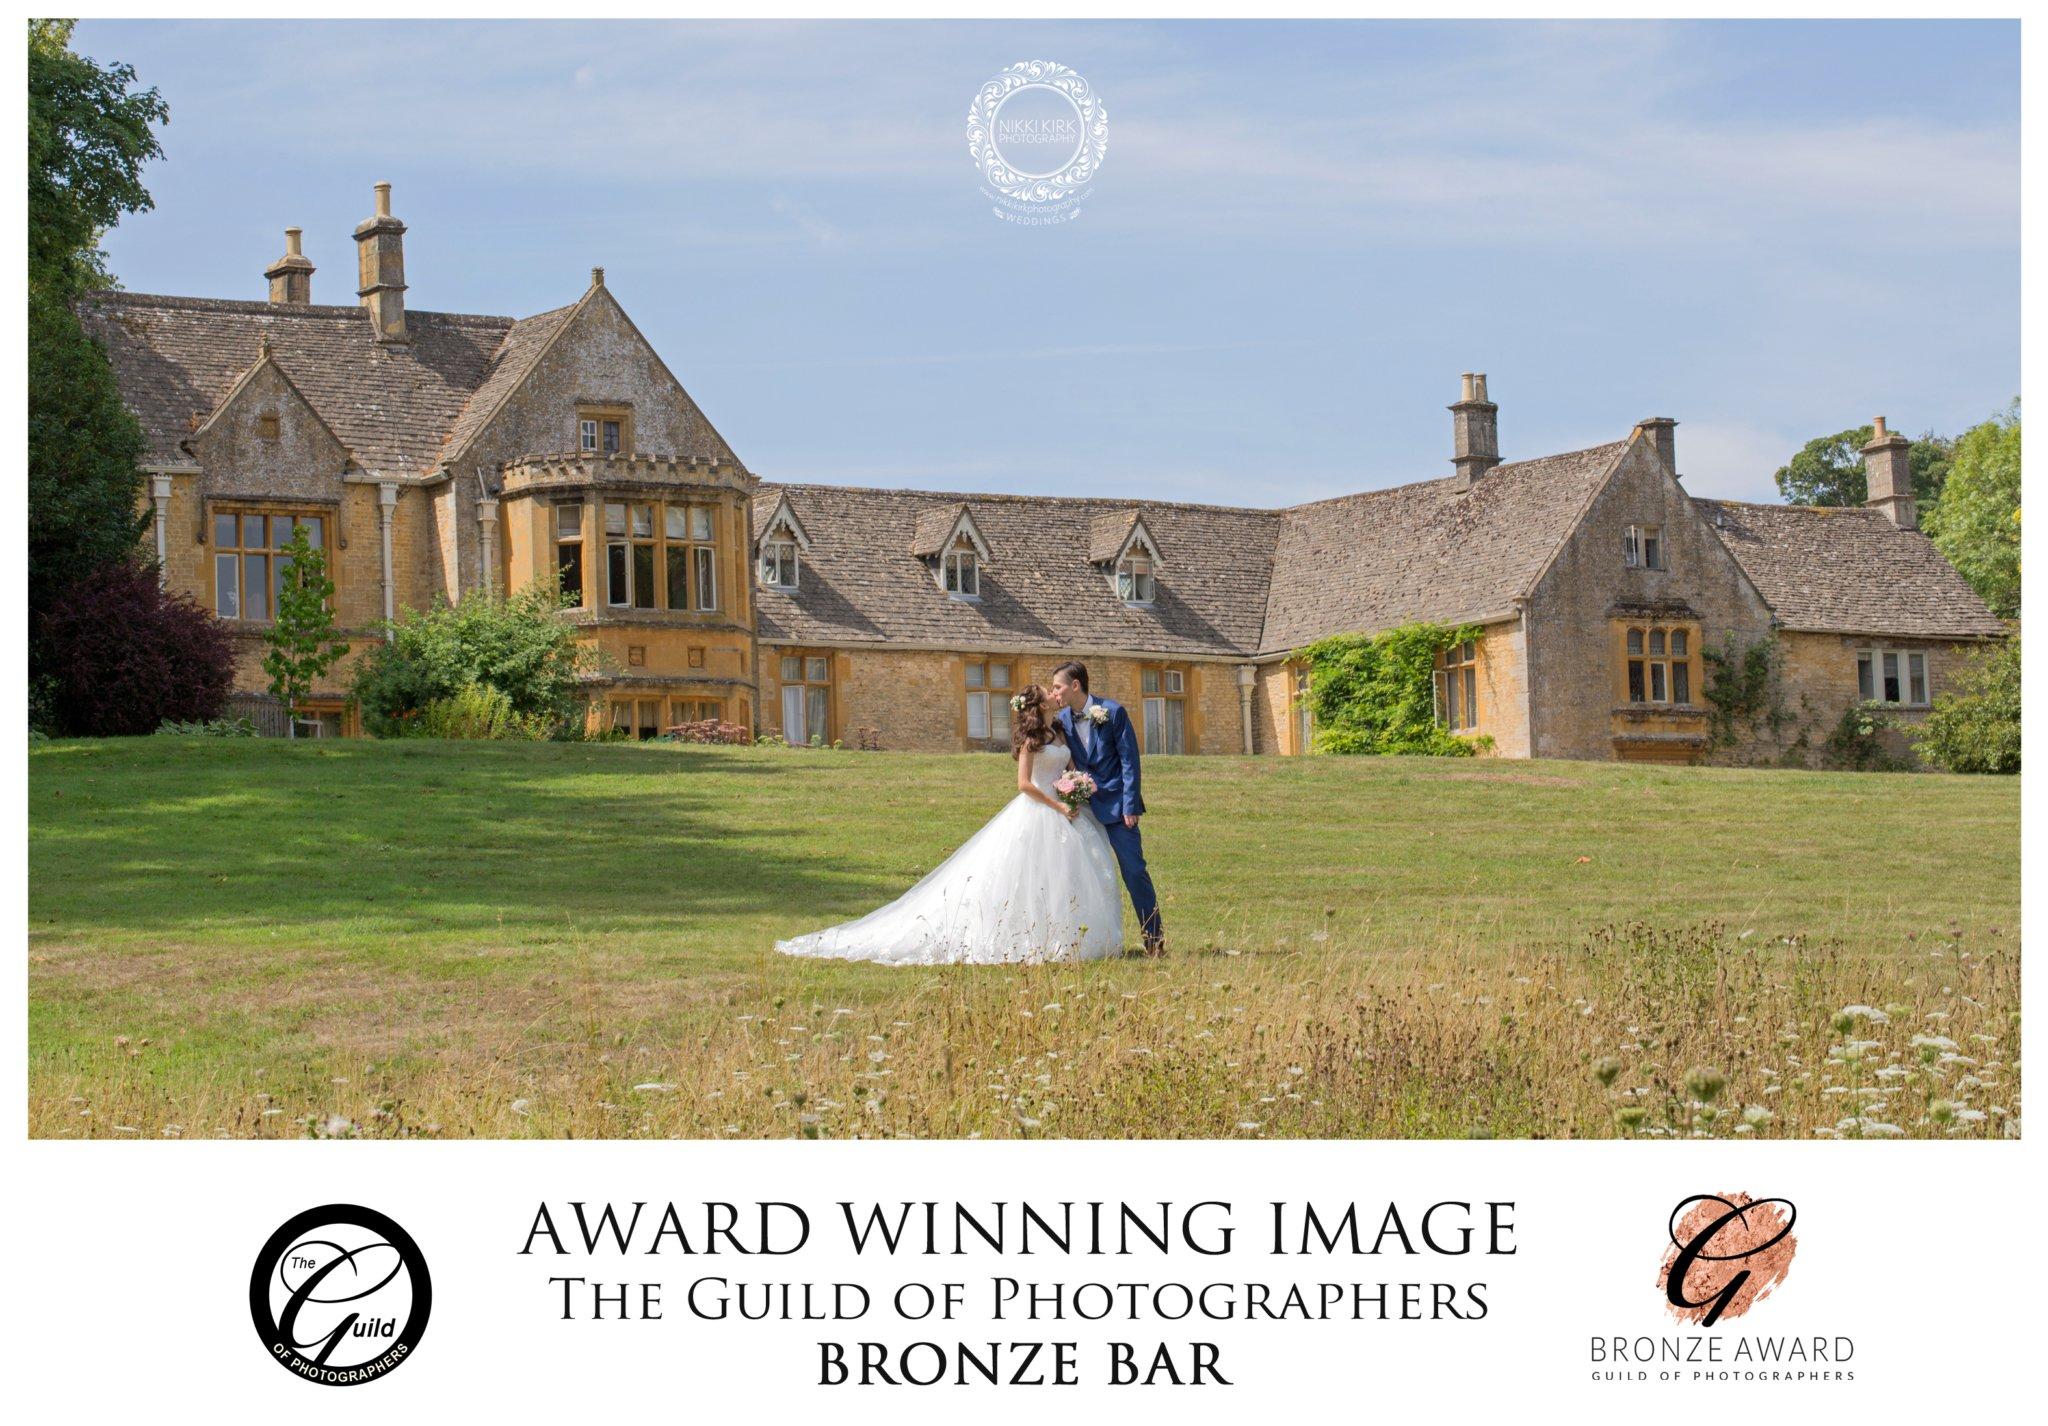 Lords-of-the-Manor-wedding-photographer-Nikki-Kirk-Photography-award-winning